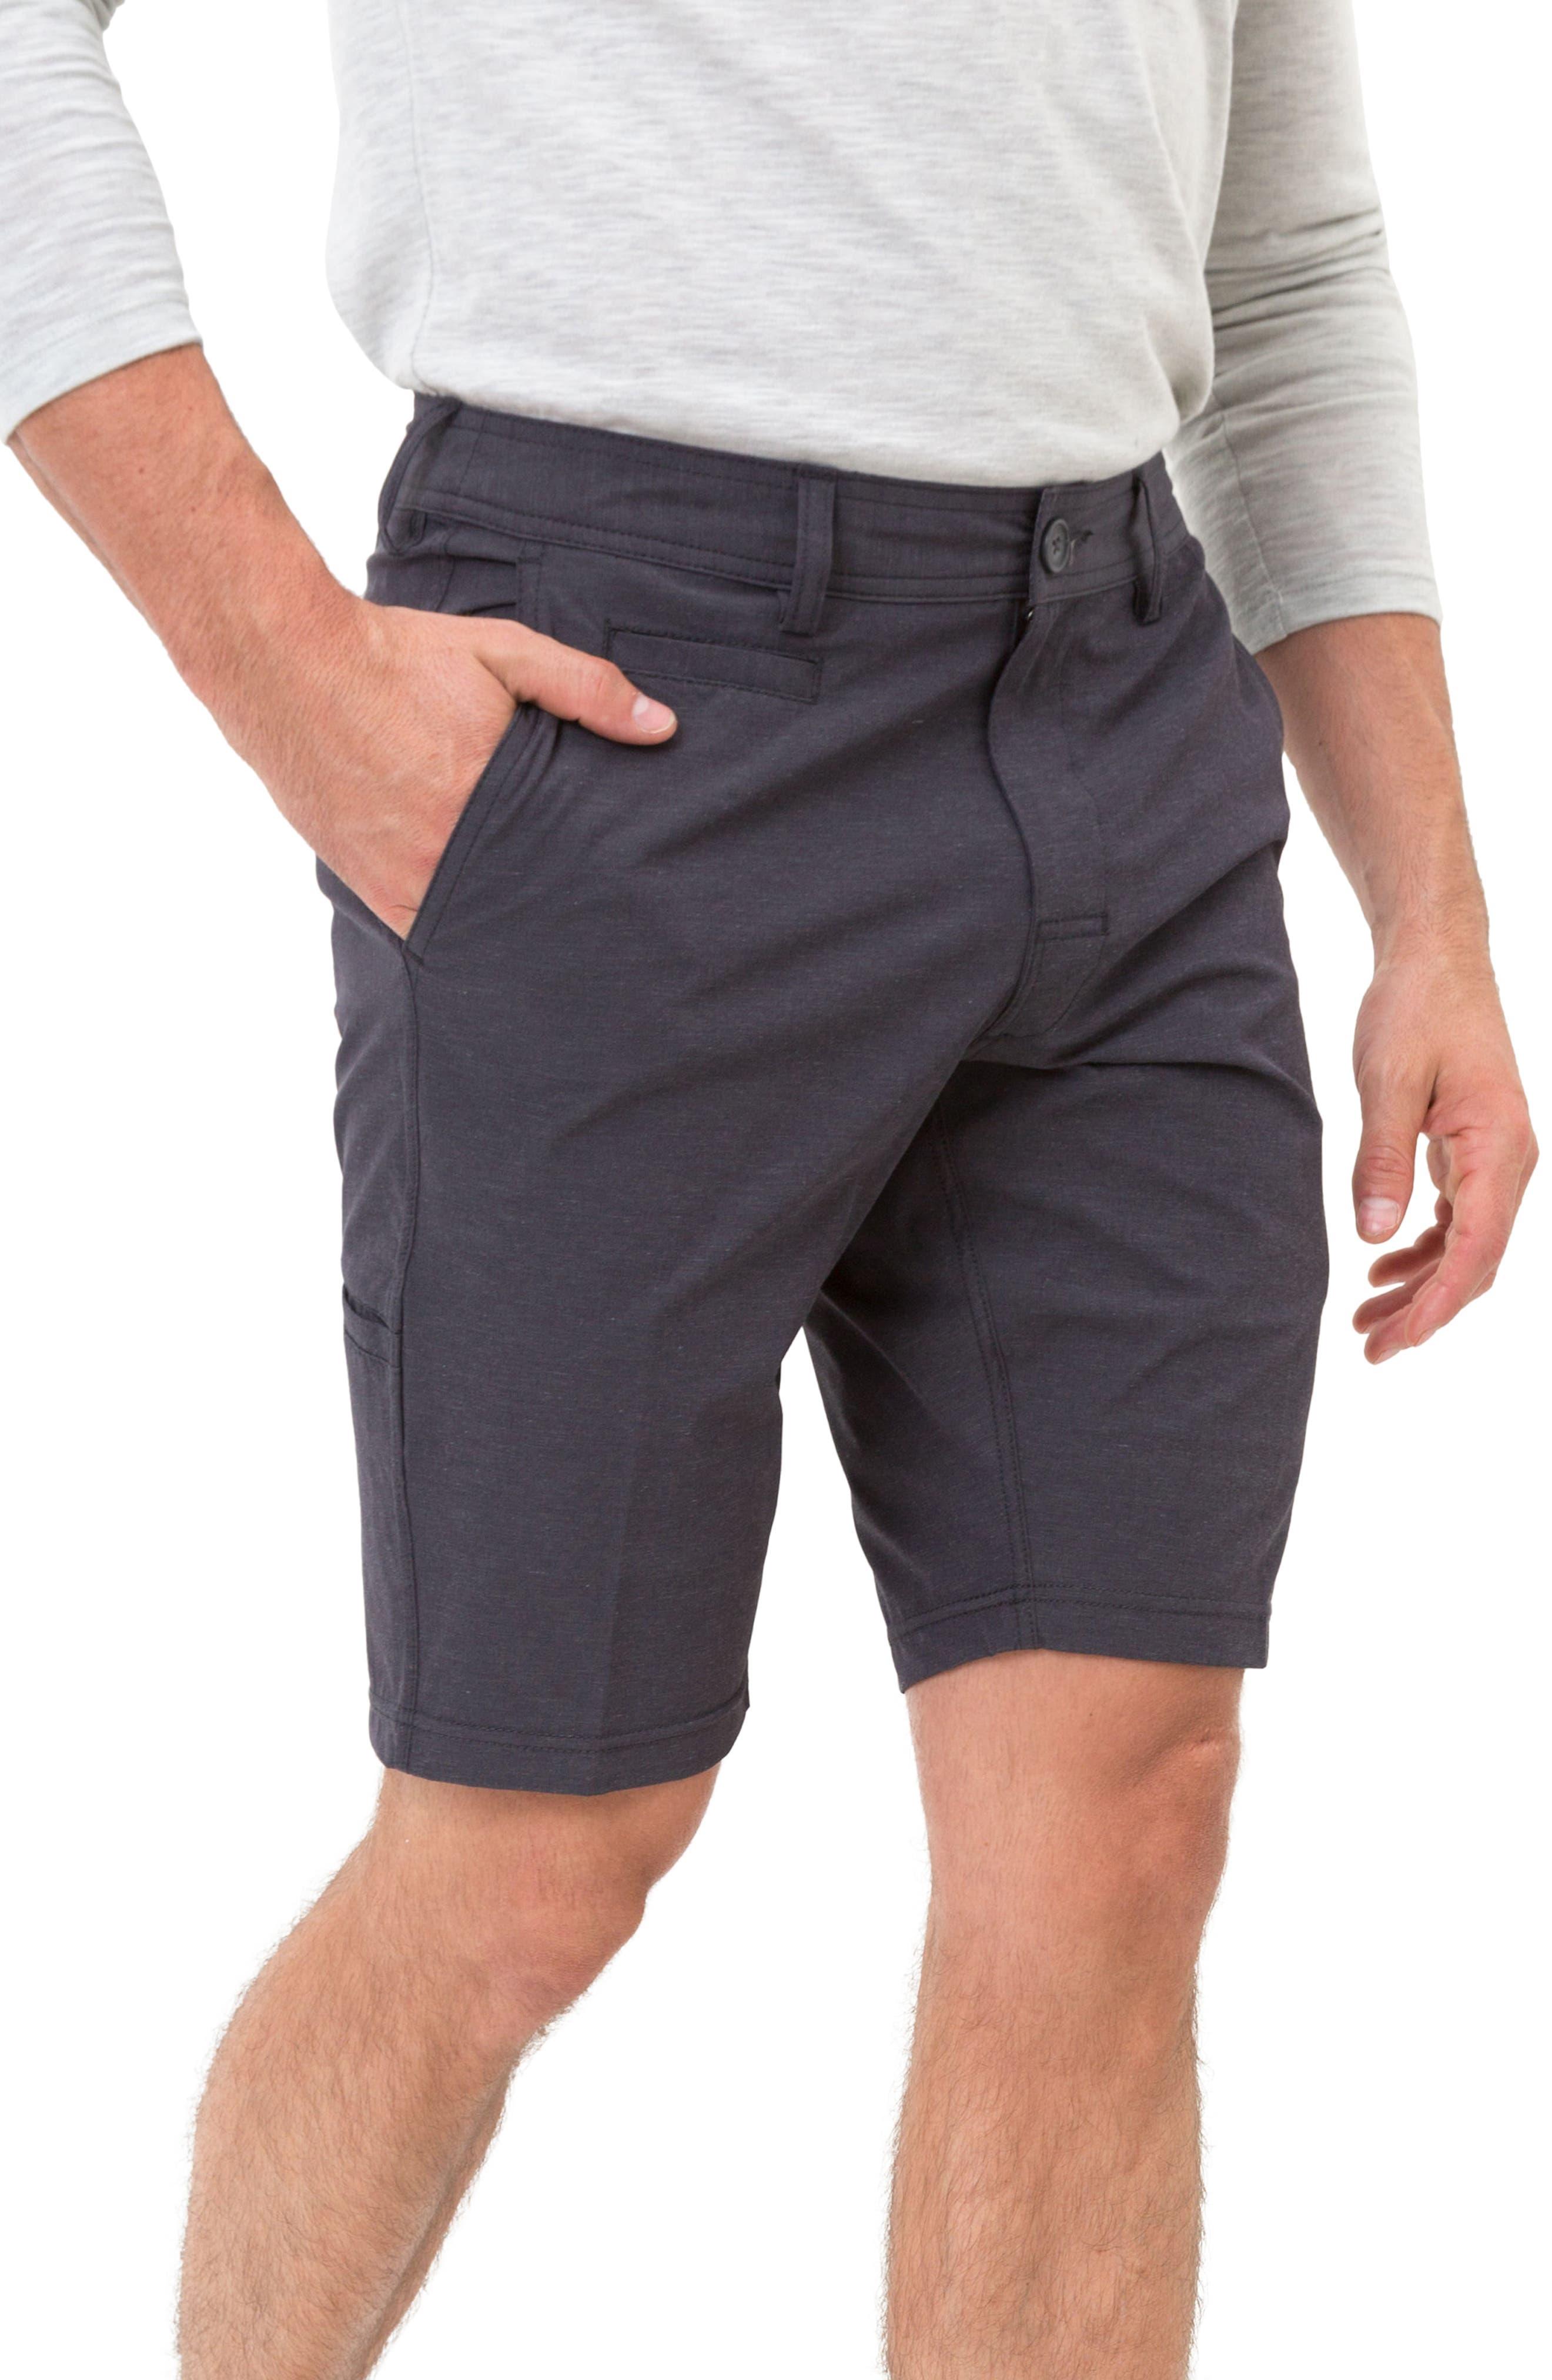 Velocity Hybrid Shorts,                             Main thumbnail 1, color,                             CHARCOAL